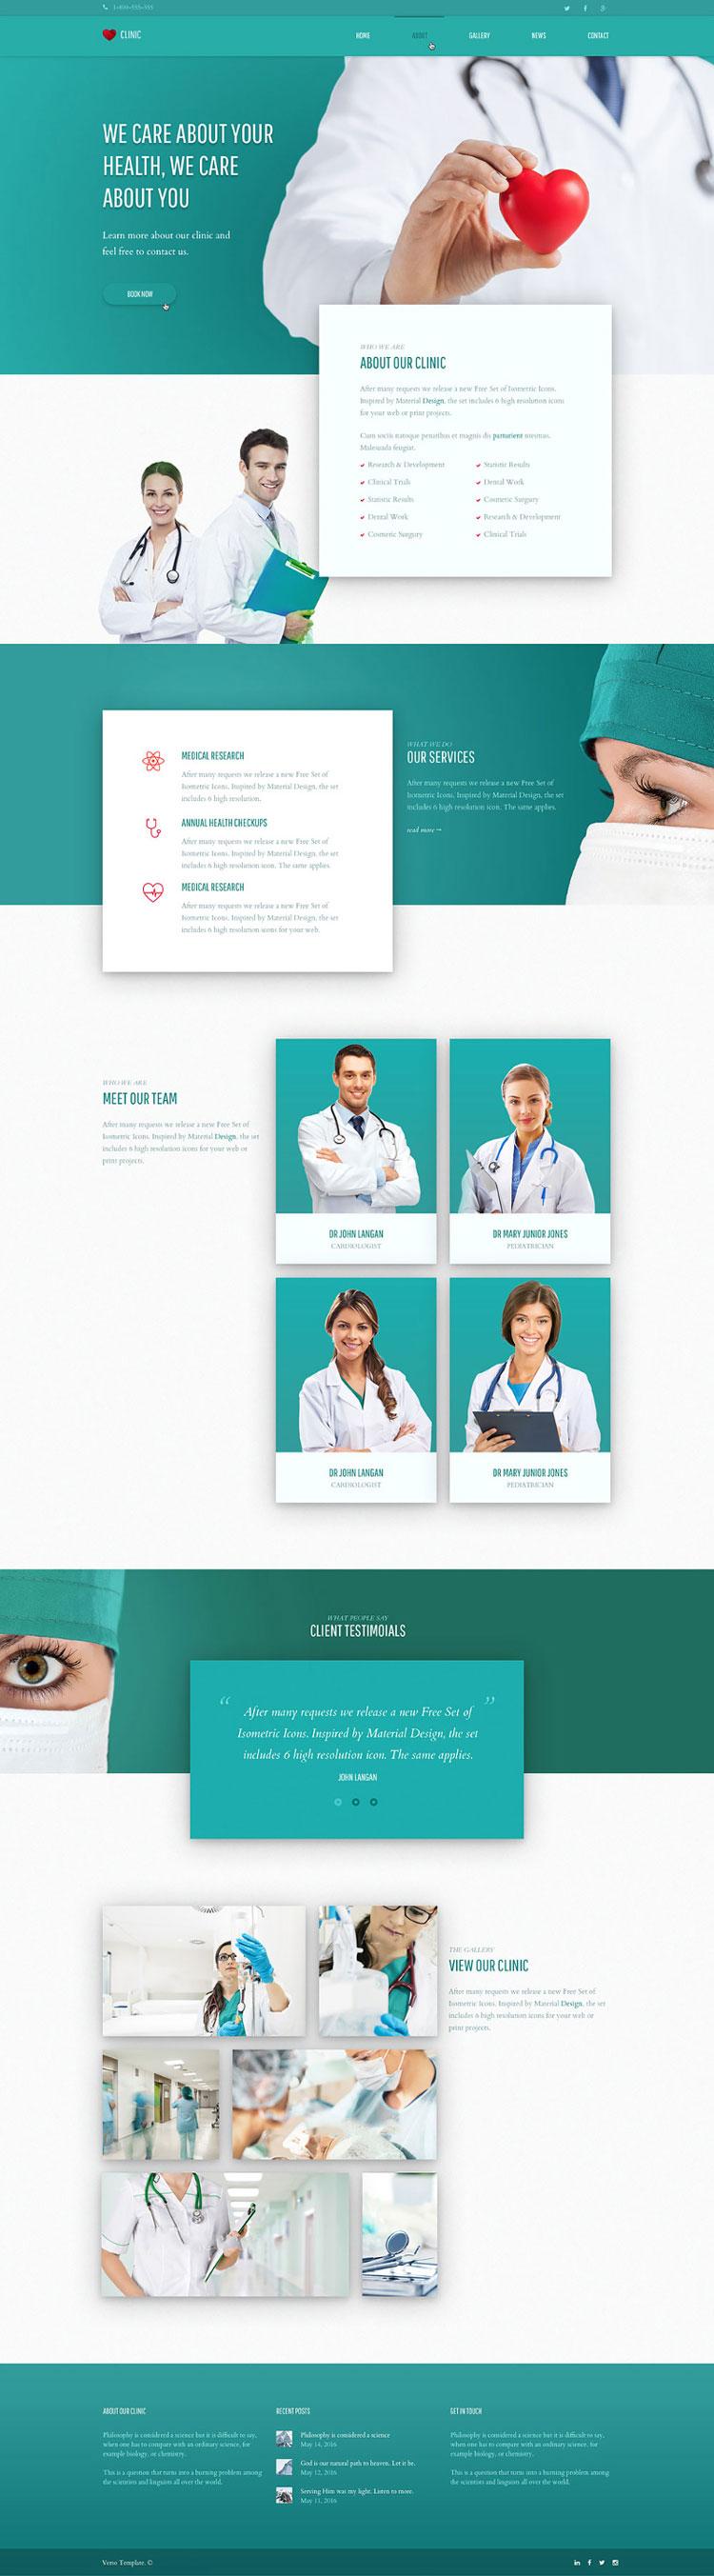 p416 - طرح آماده وب سایت پزشکی سلامت بسیار زیبا